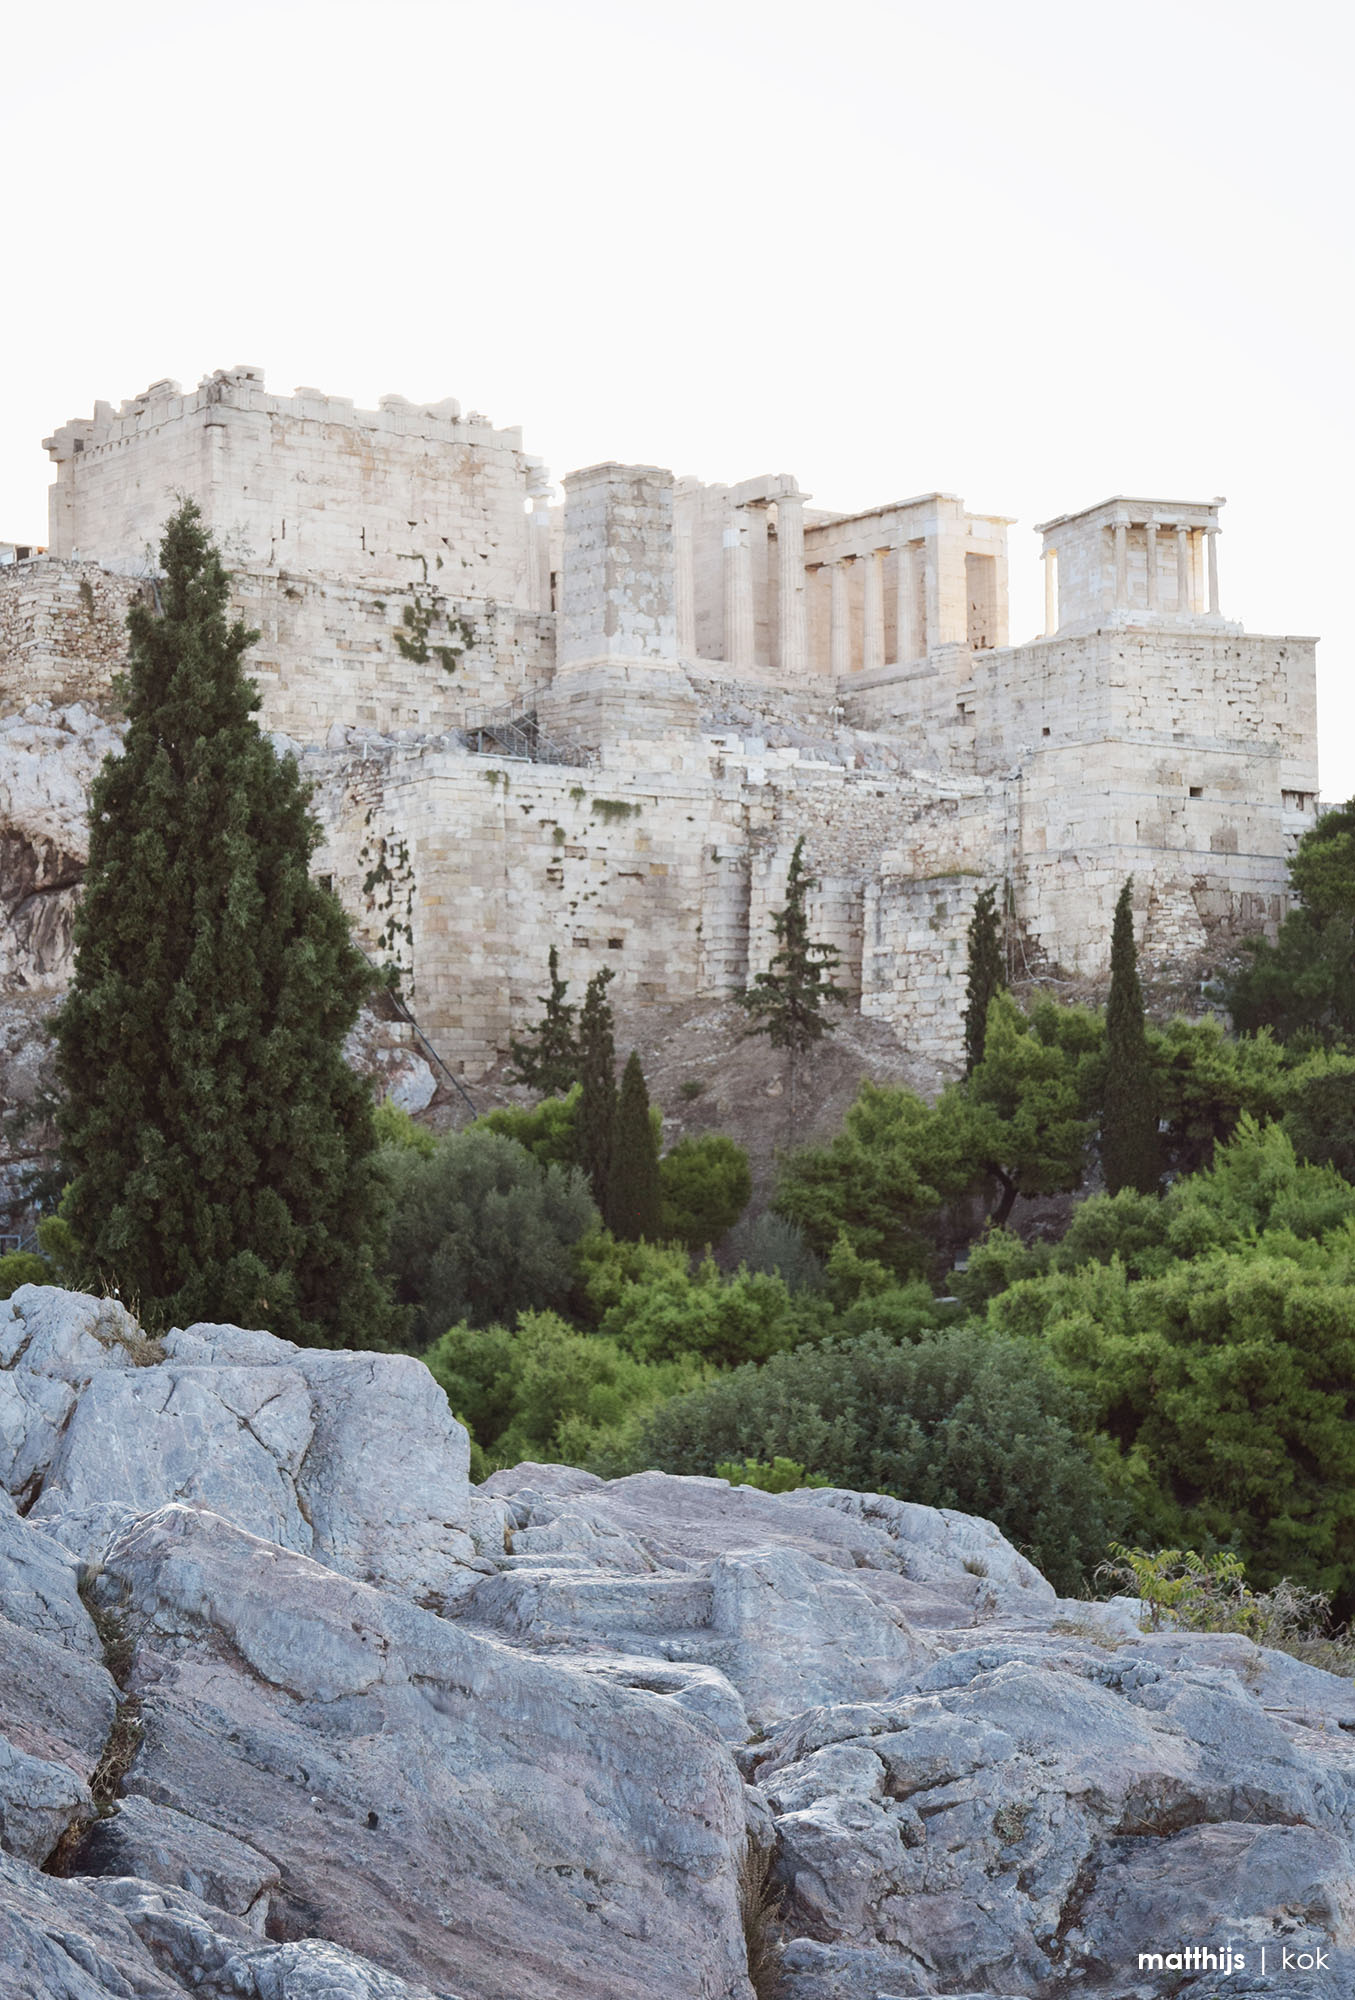 Acropolis of Athens, Greece | Photo by Matthijs Kok